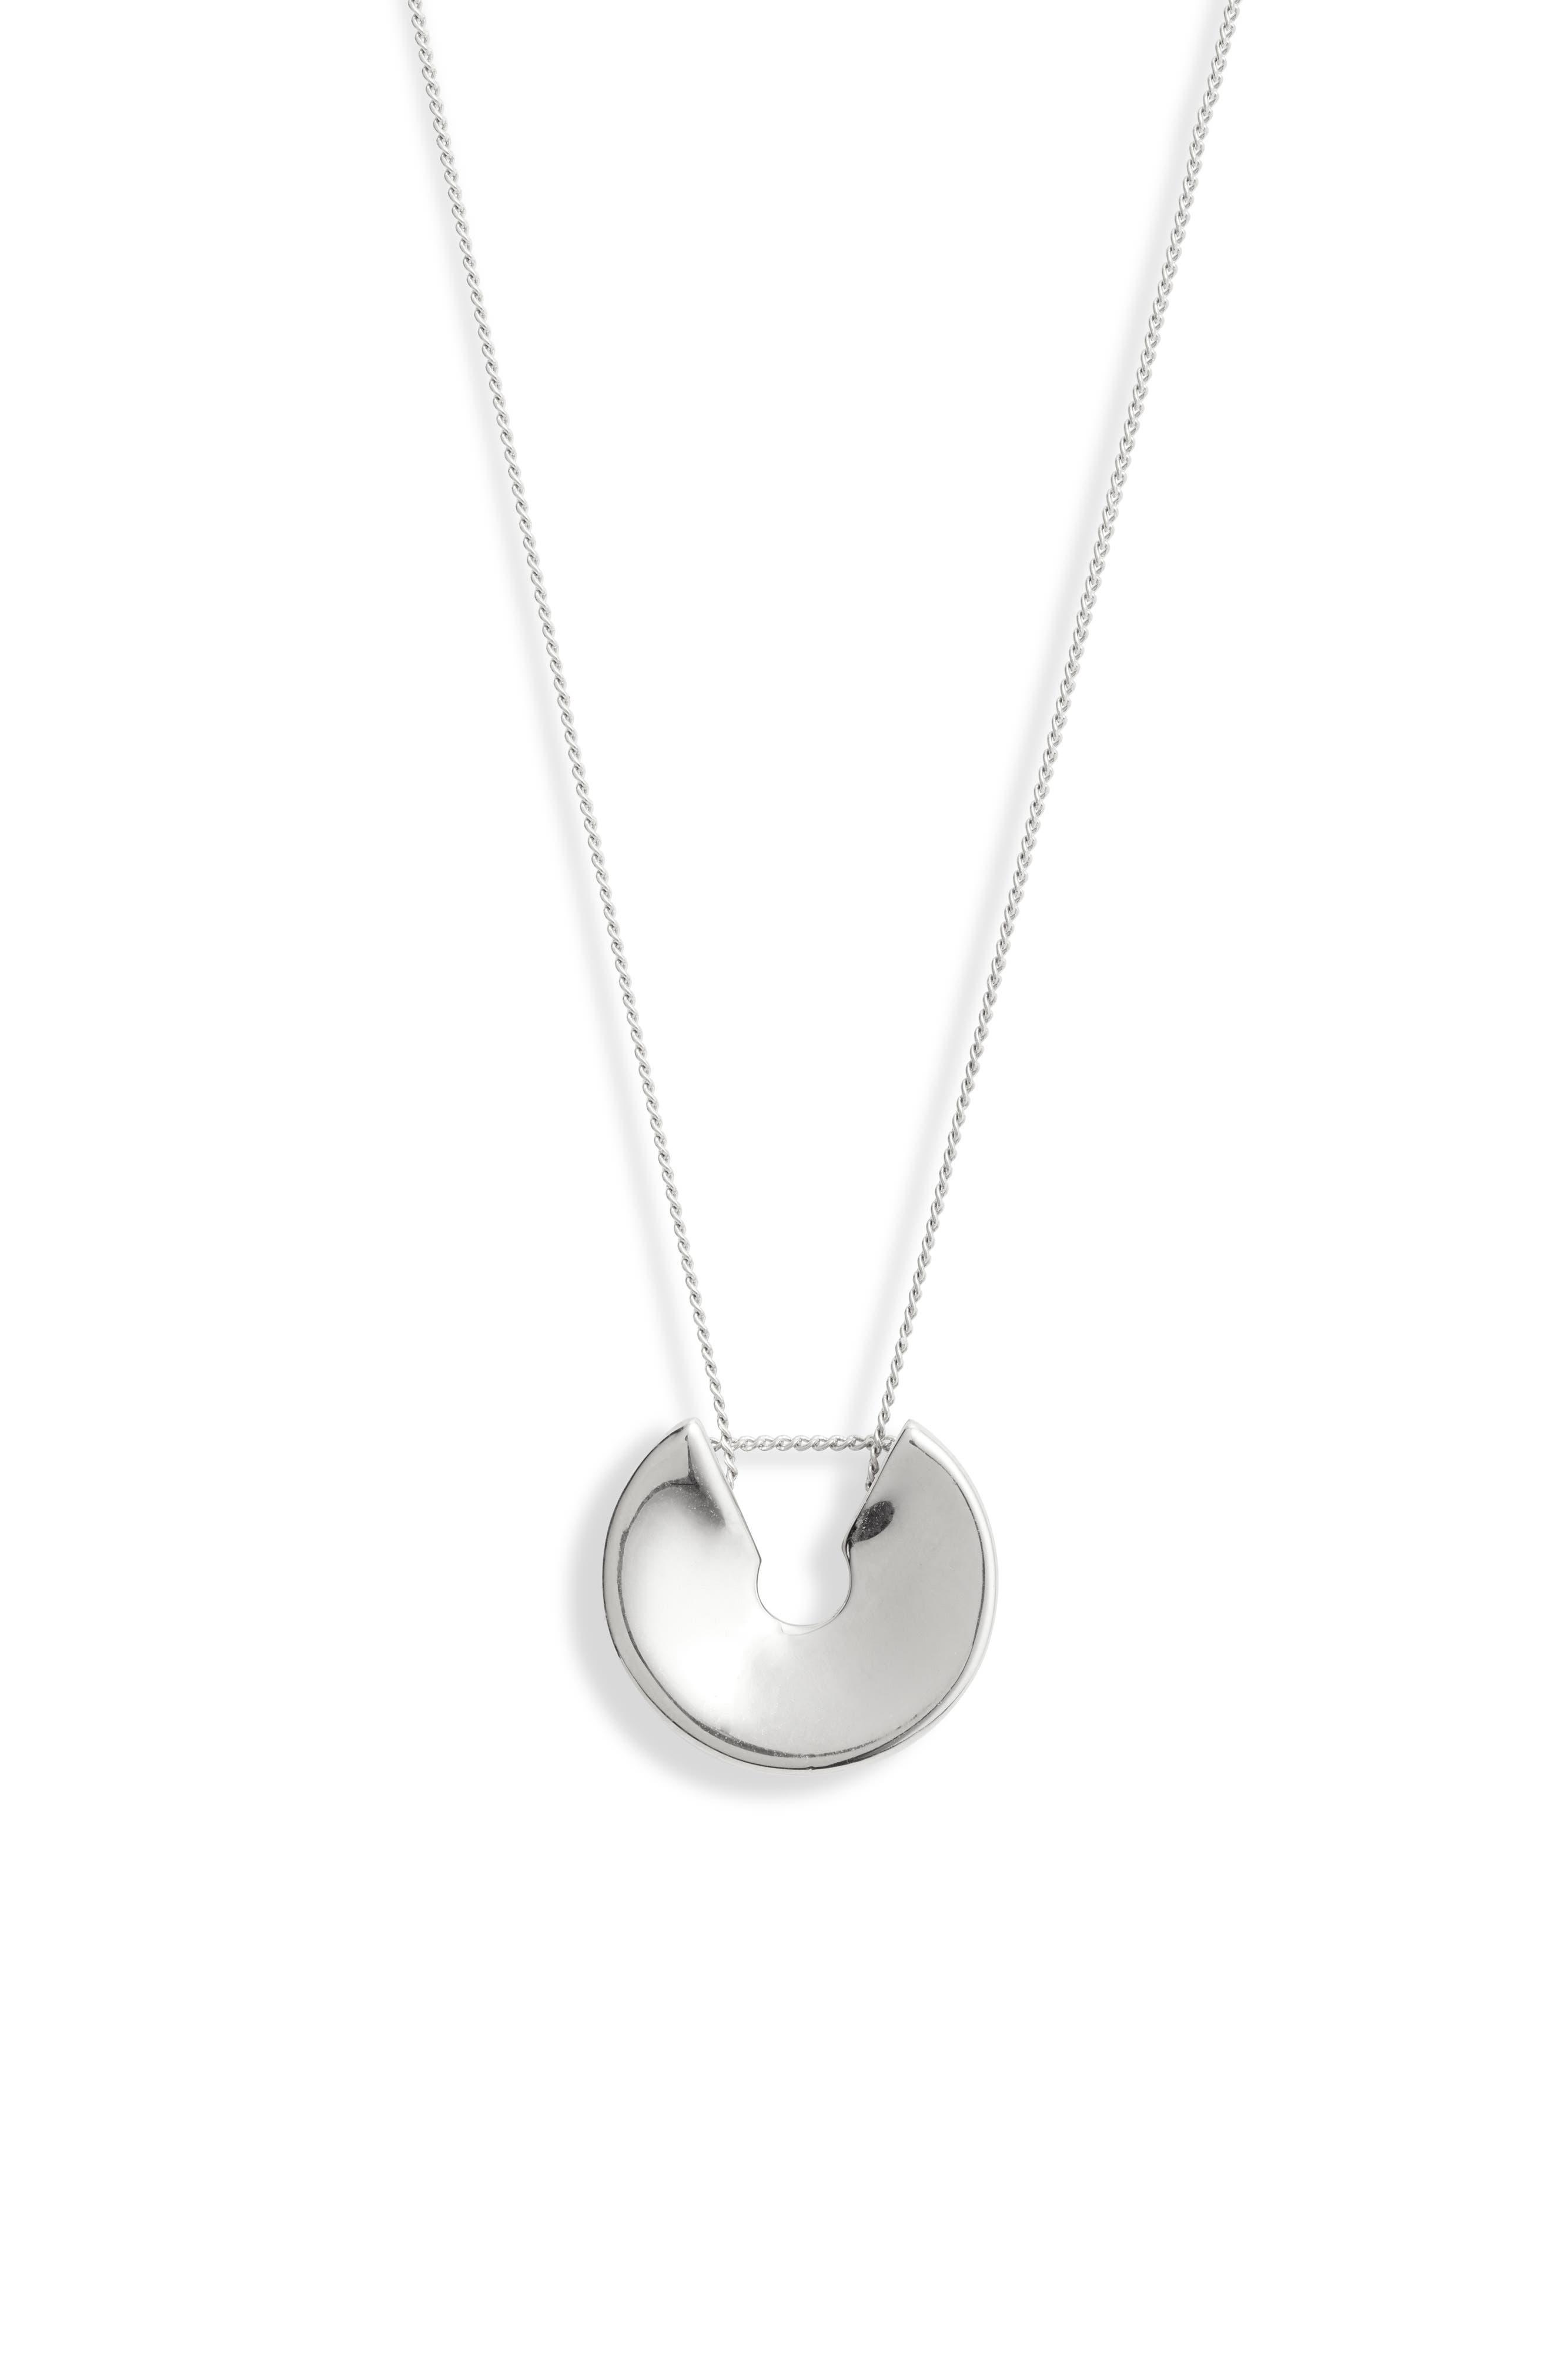 Hidden Heart Pendant Necklace